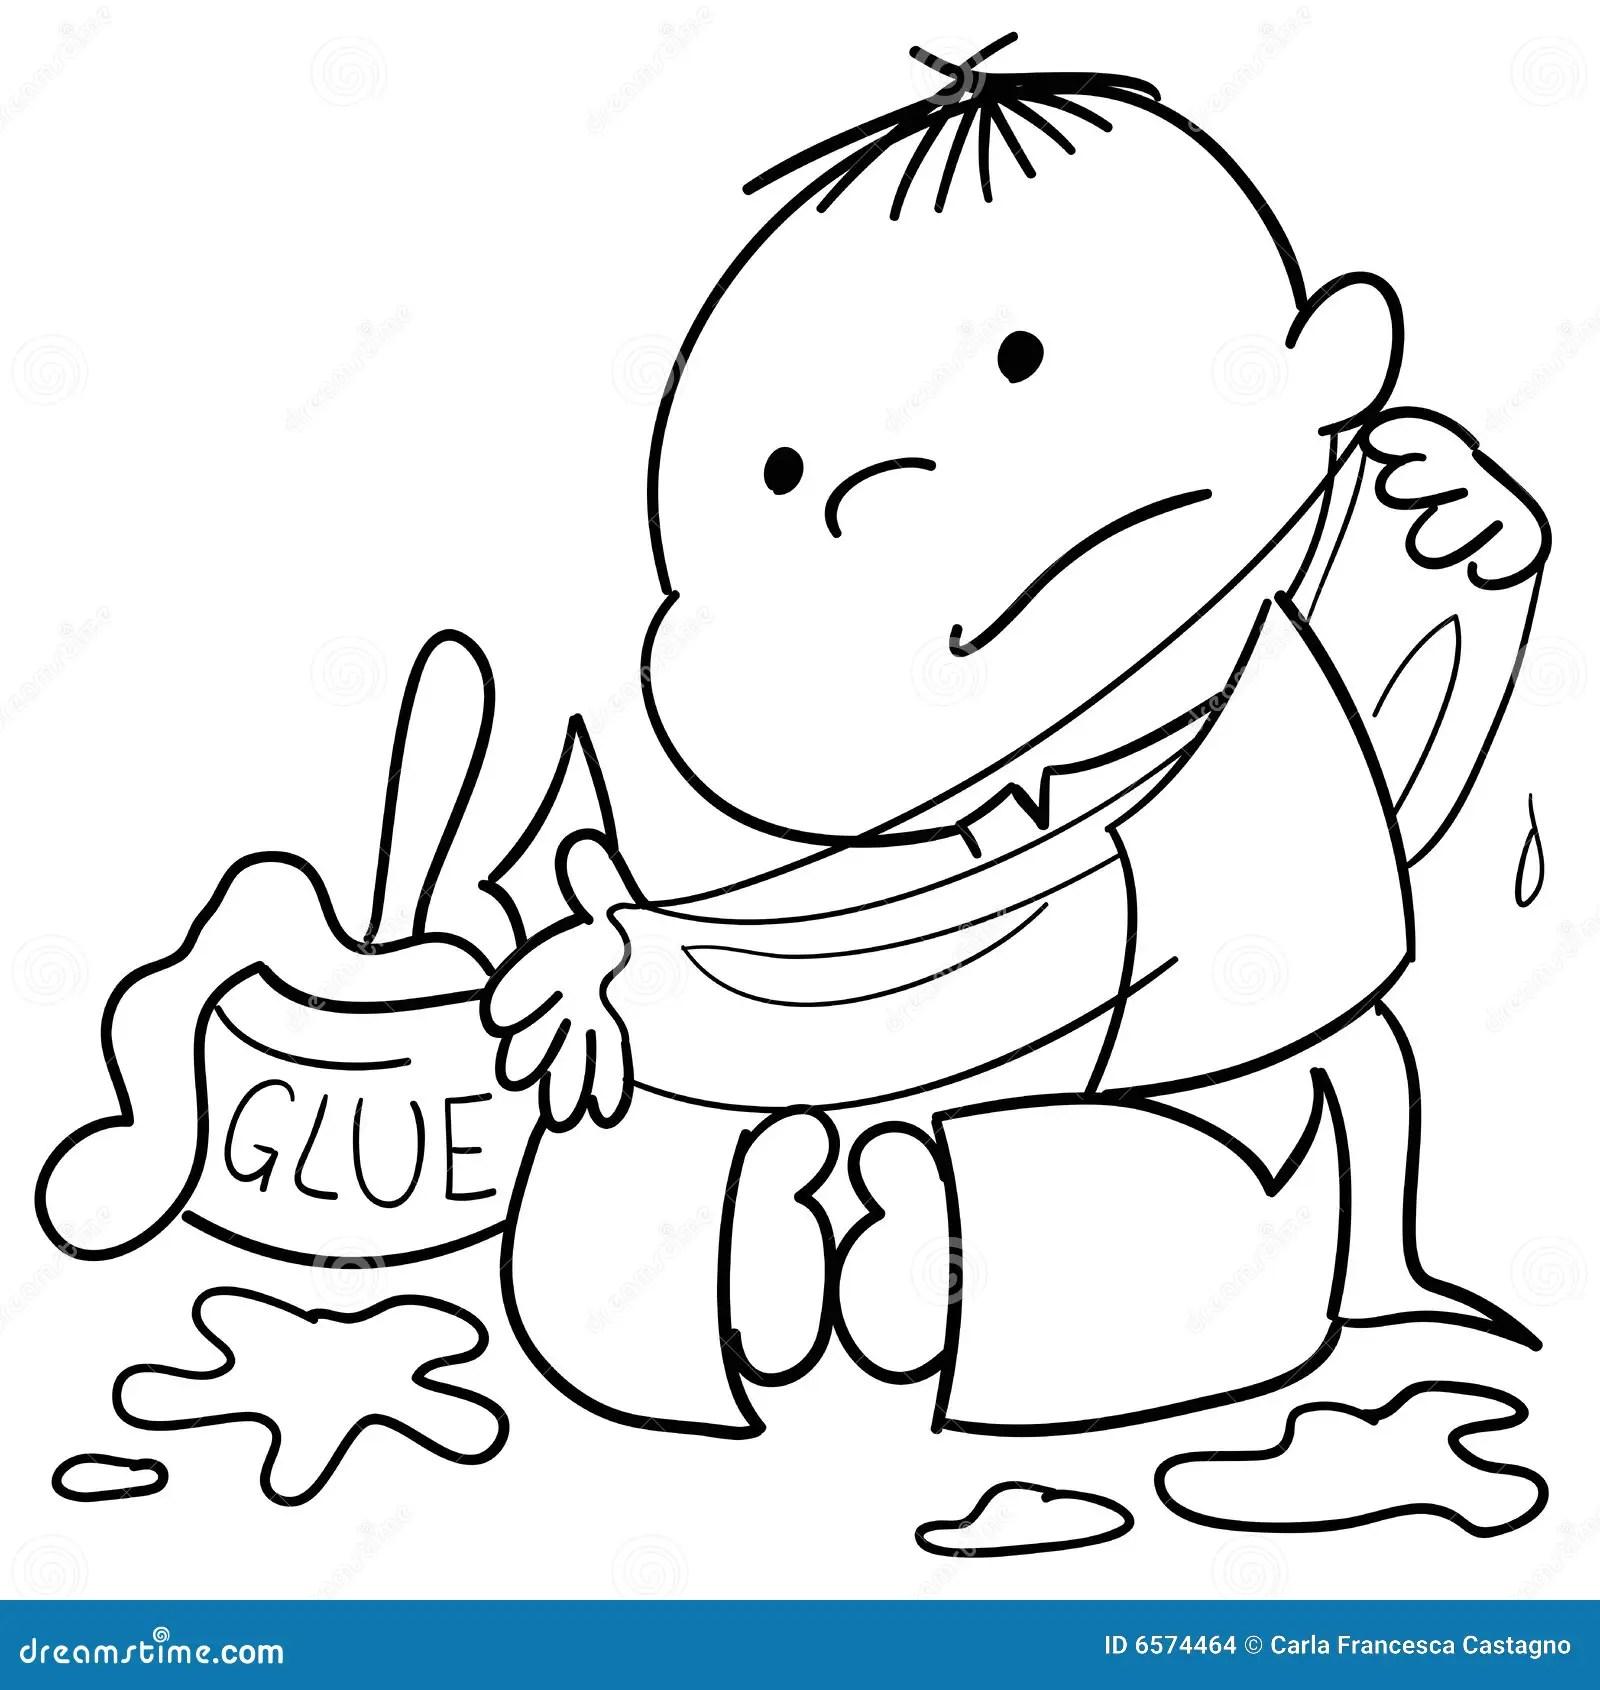 Child Dirty Of Glue Stock Vector Illustration Of Children